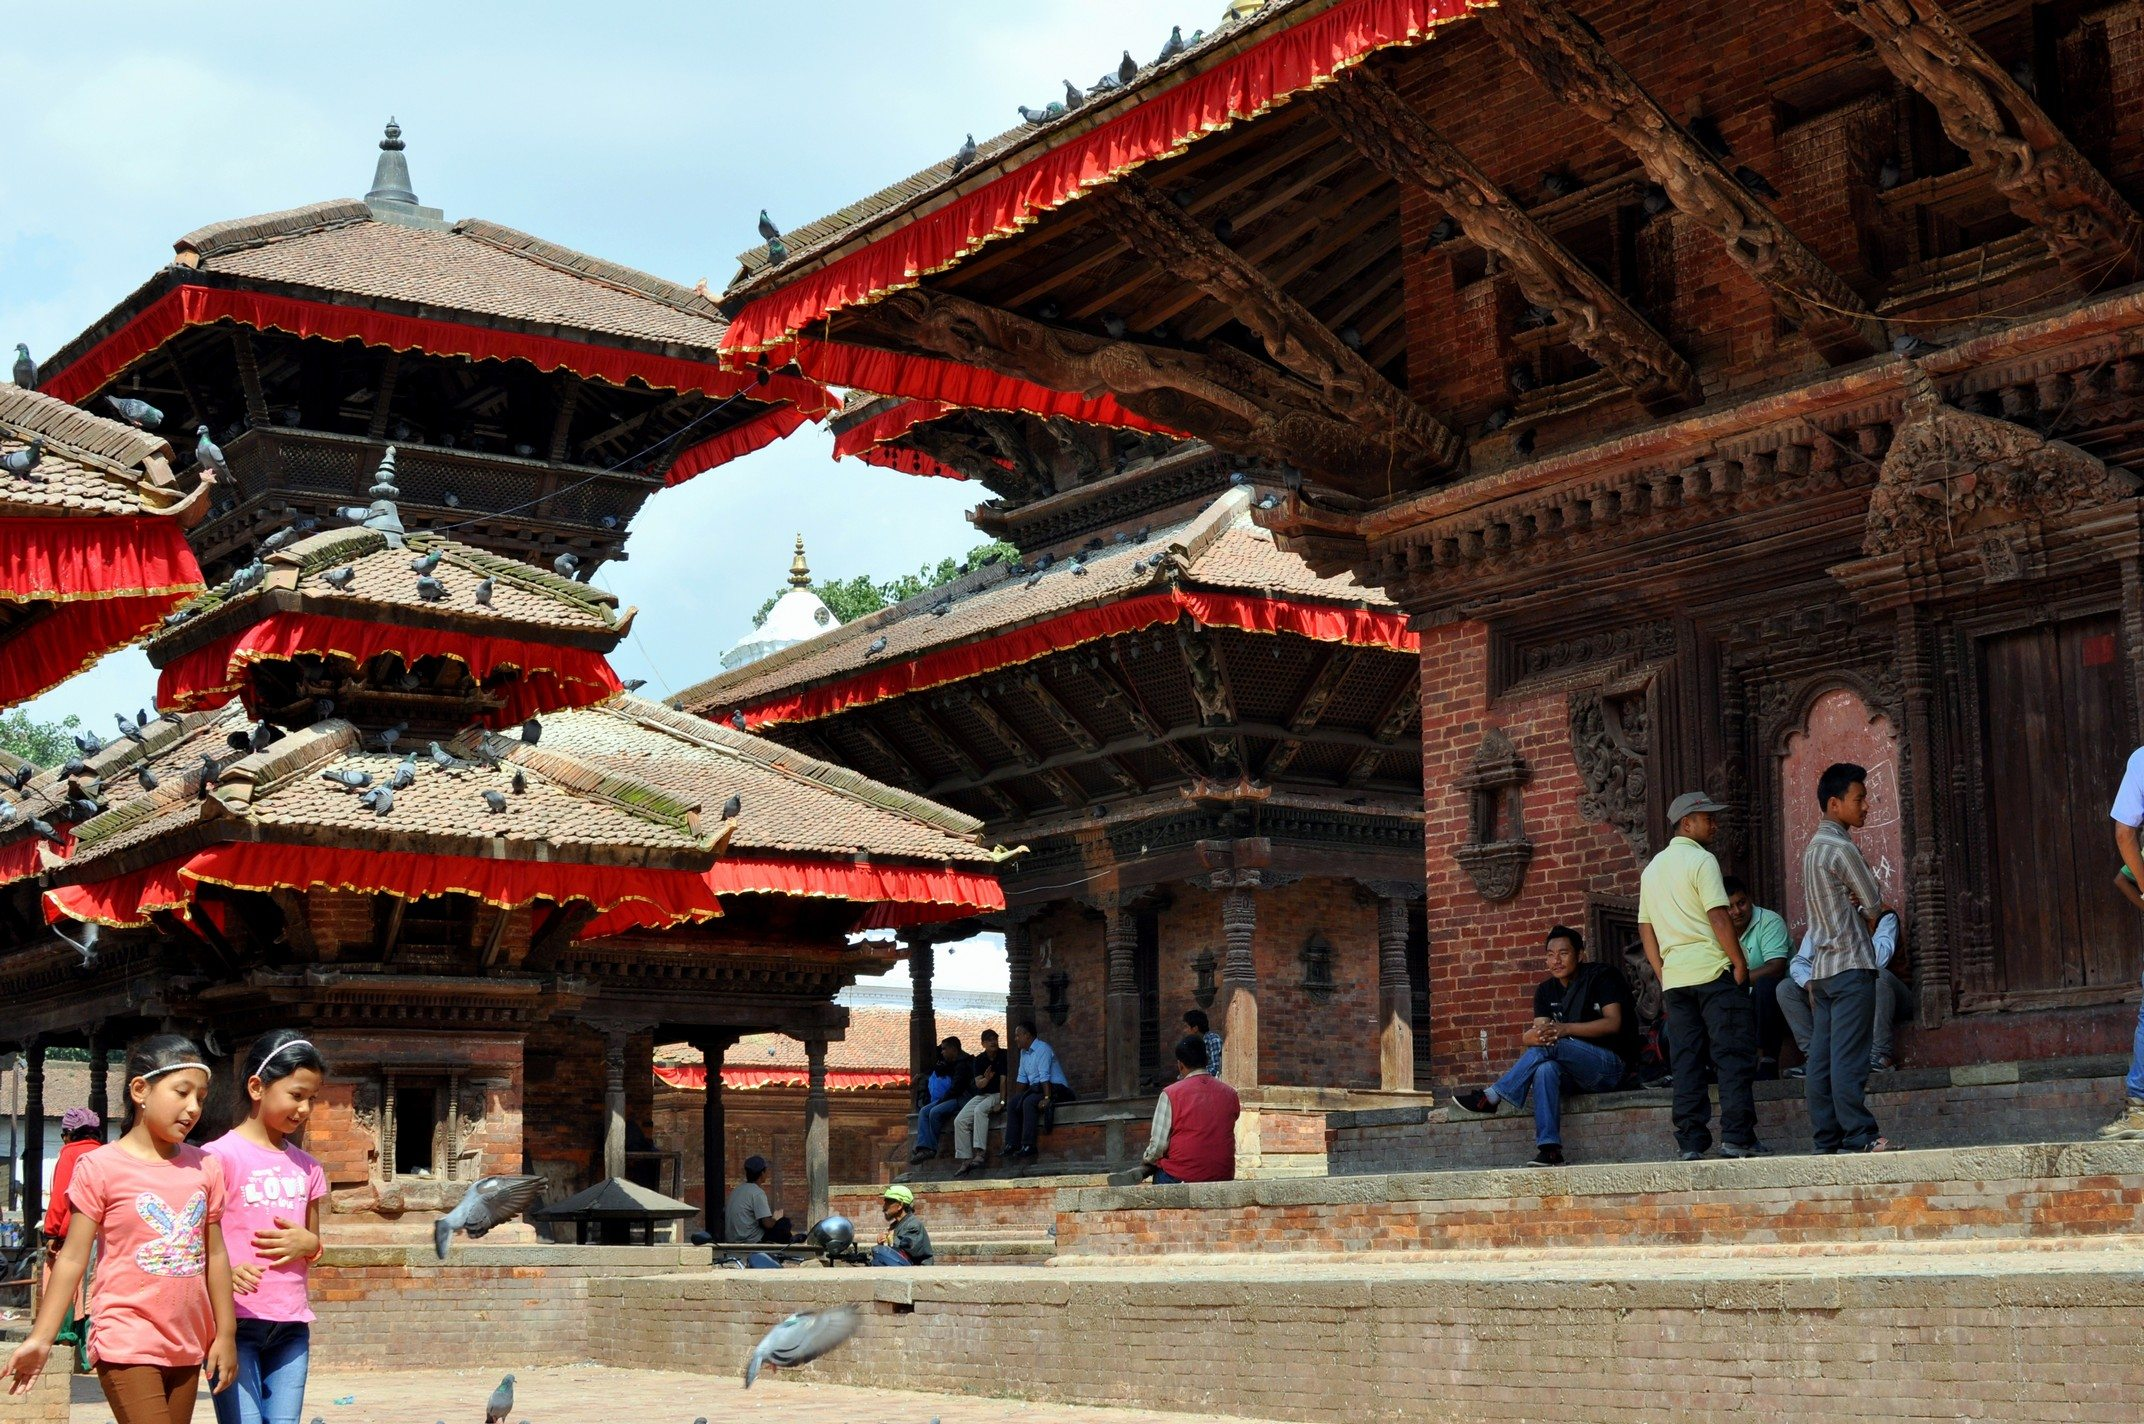 Katmandou, Durbar Square. Temples d'Indrapur, de Jagannath et de Vishnu